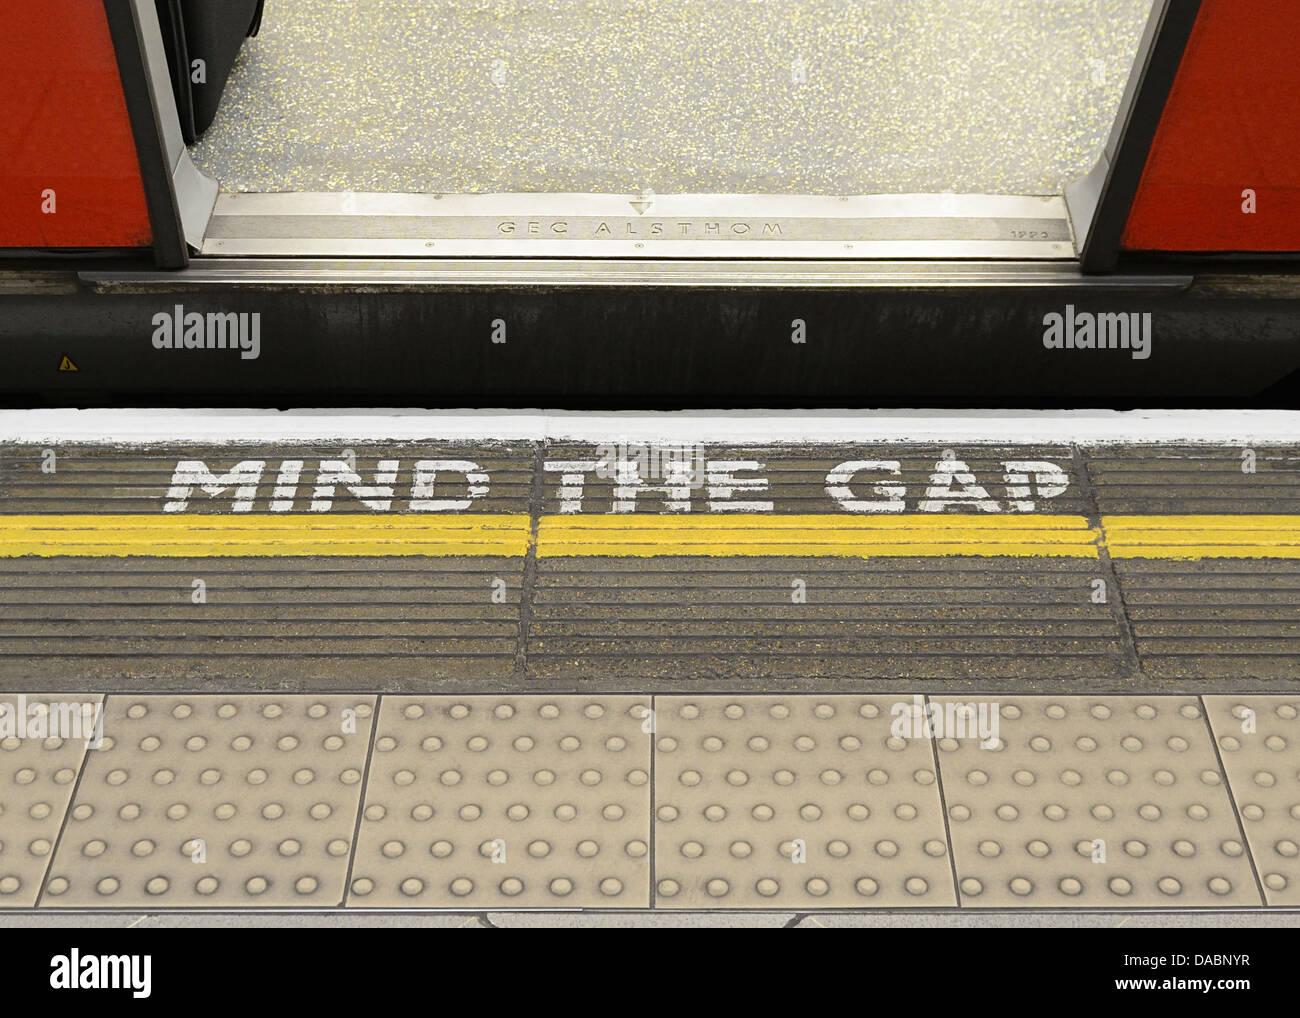 Mind the Gap Warning Sign on the Platform Edge of a London Underground Station. - Stock Image